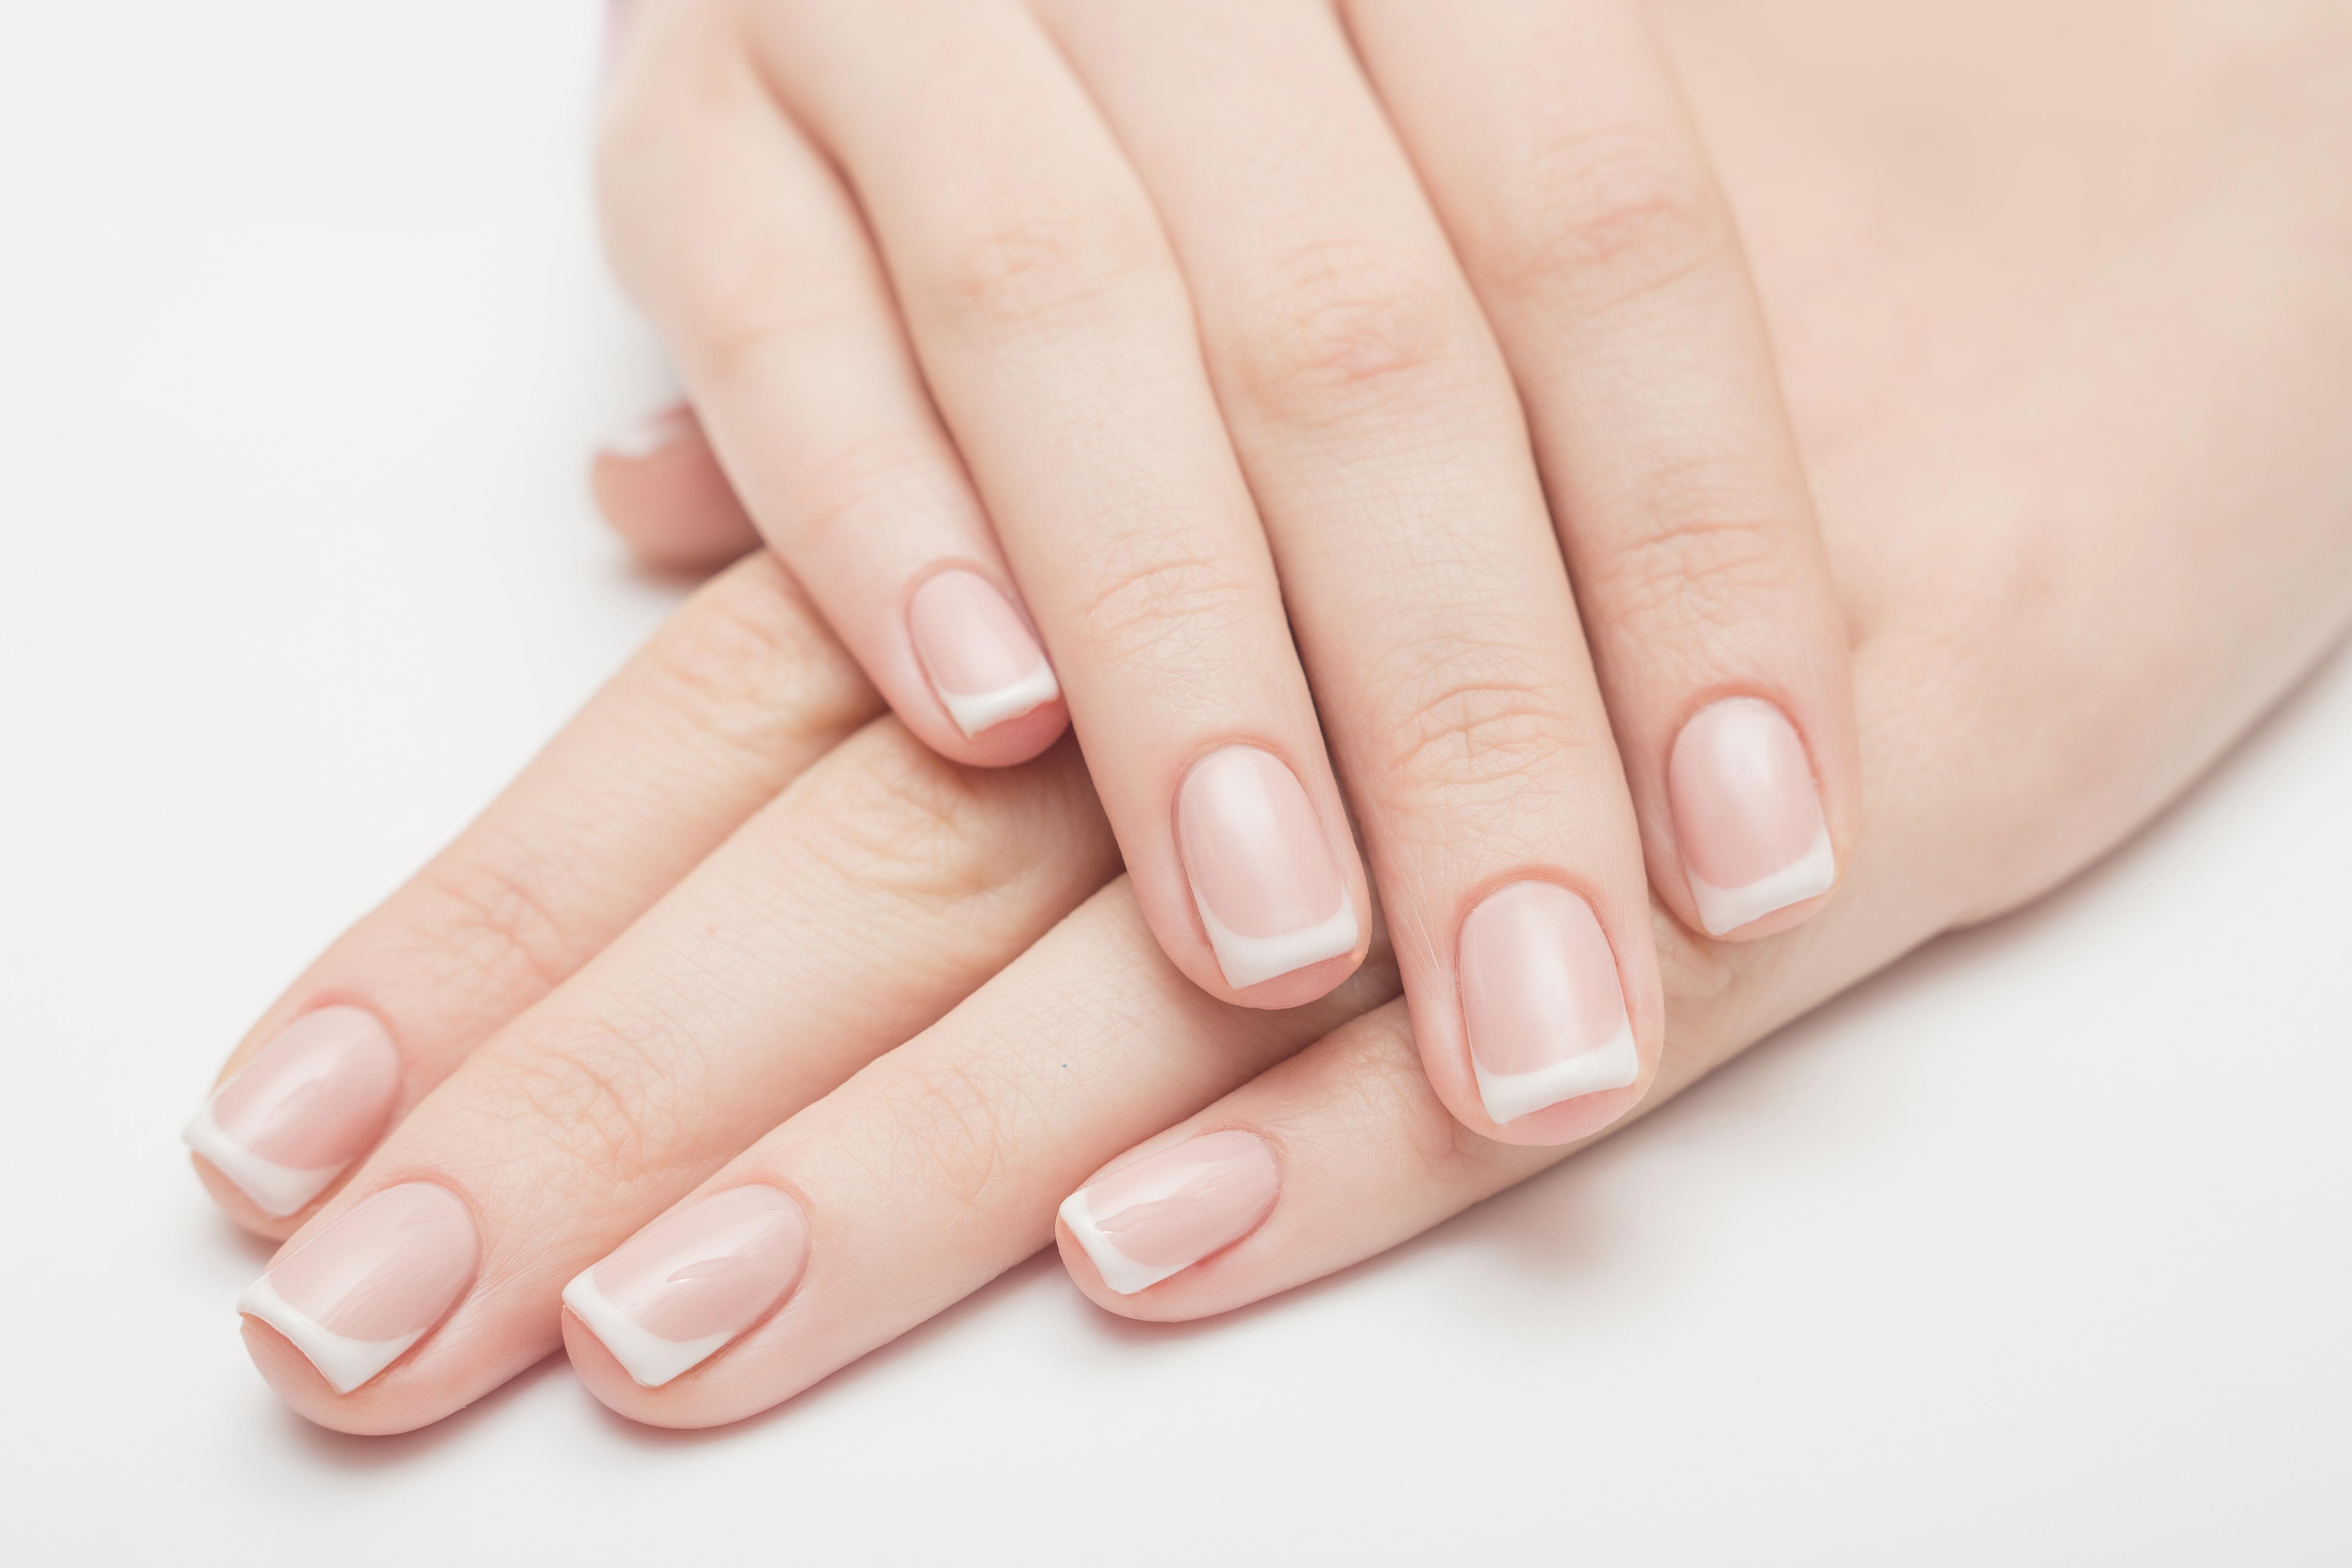 Aha! Dus daarom heb je soms witte vlekjes op je nagels!